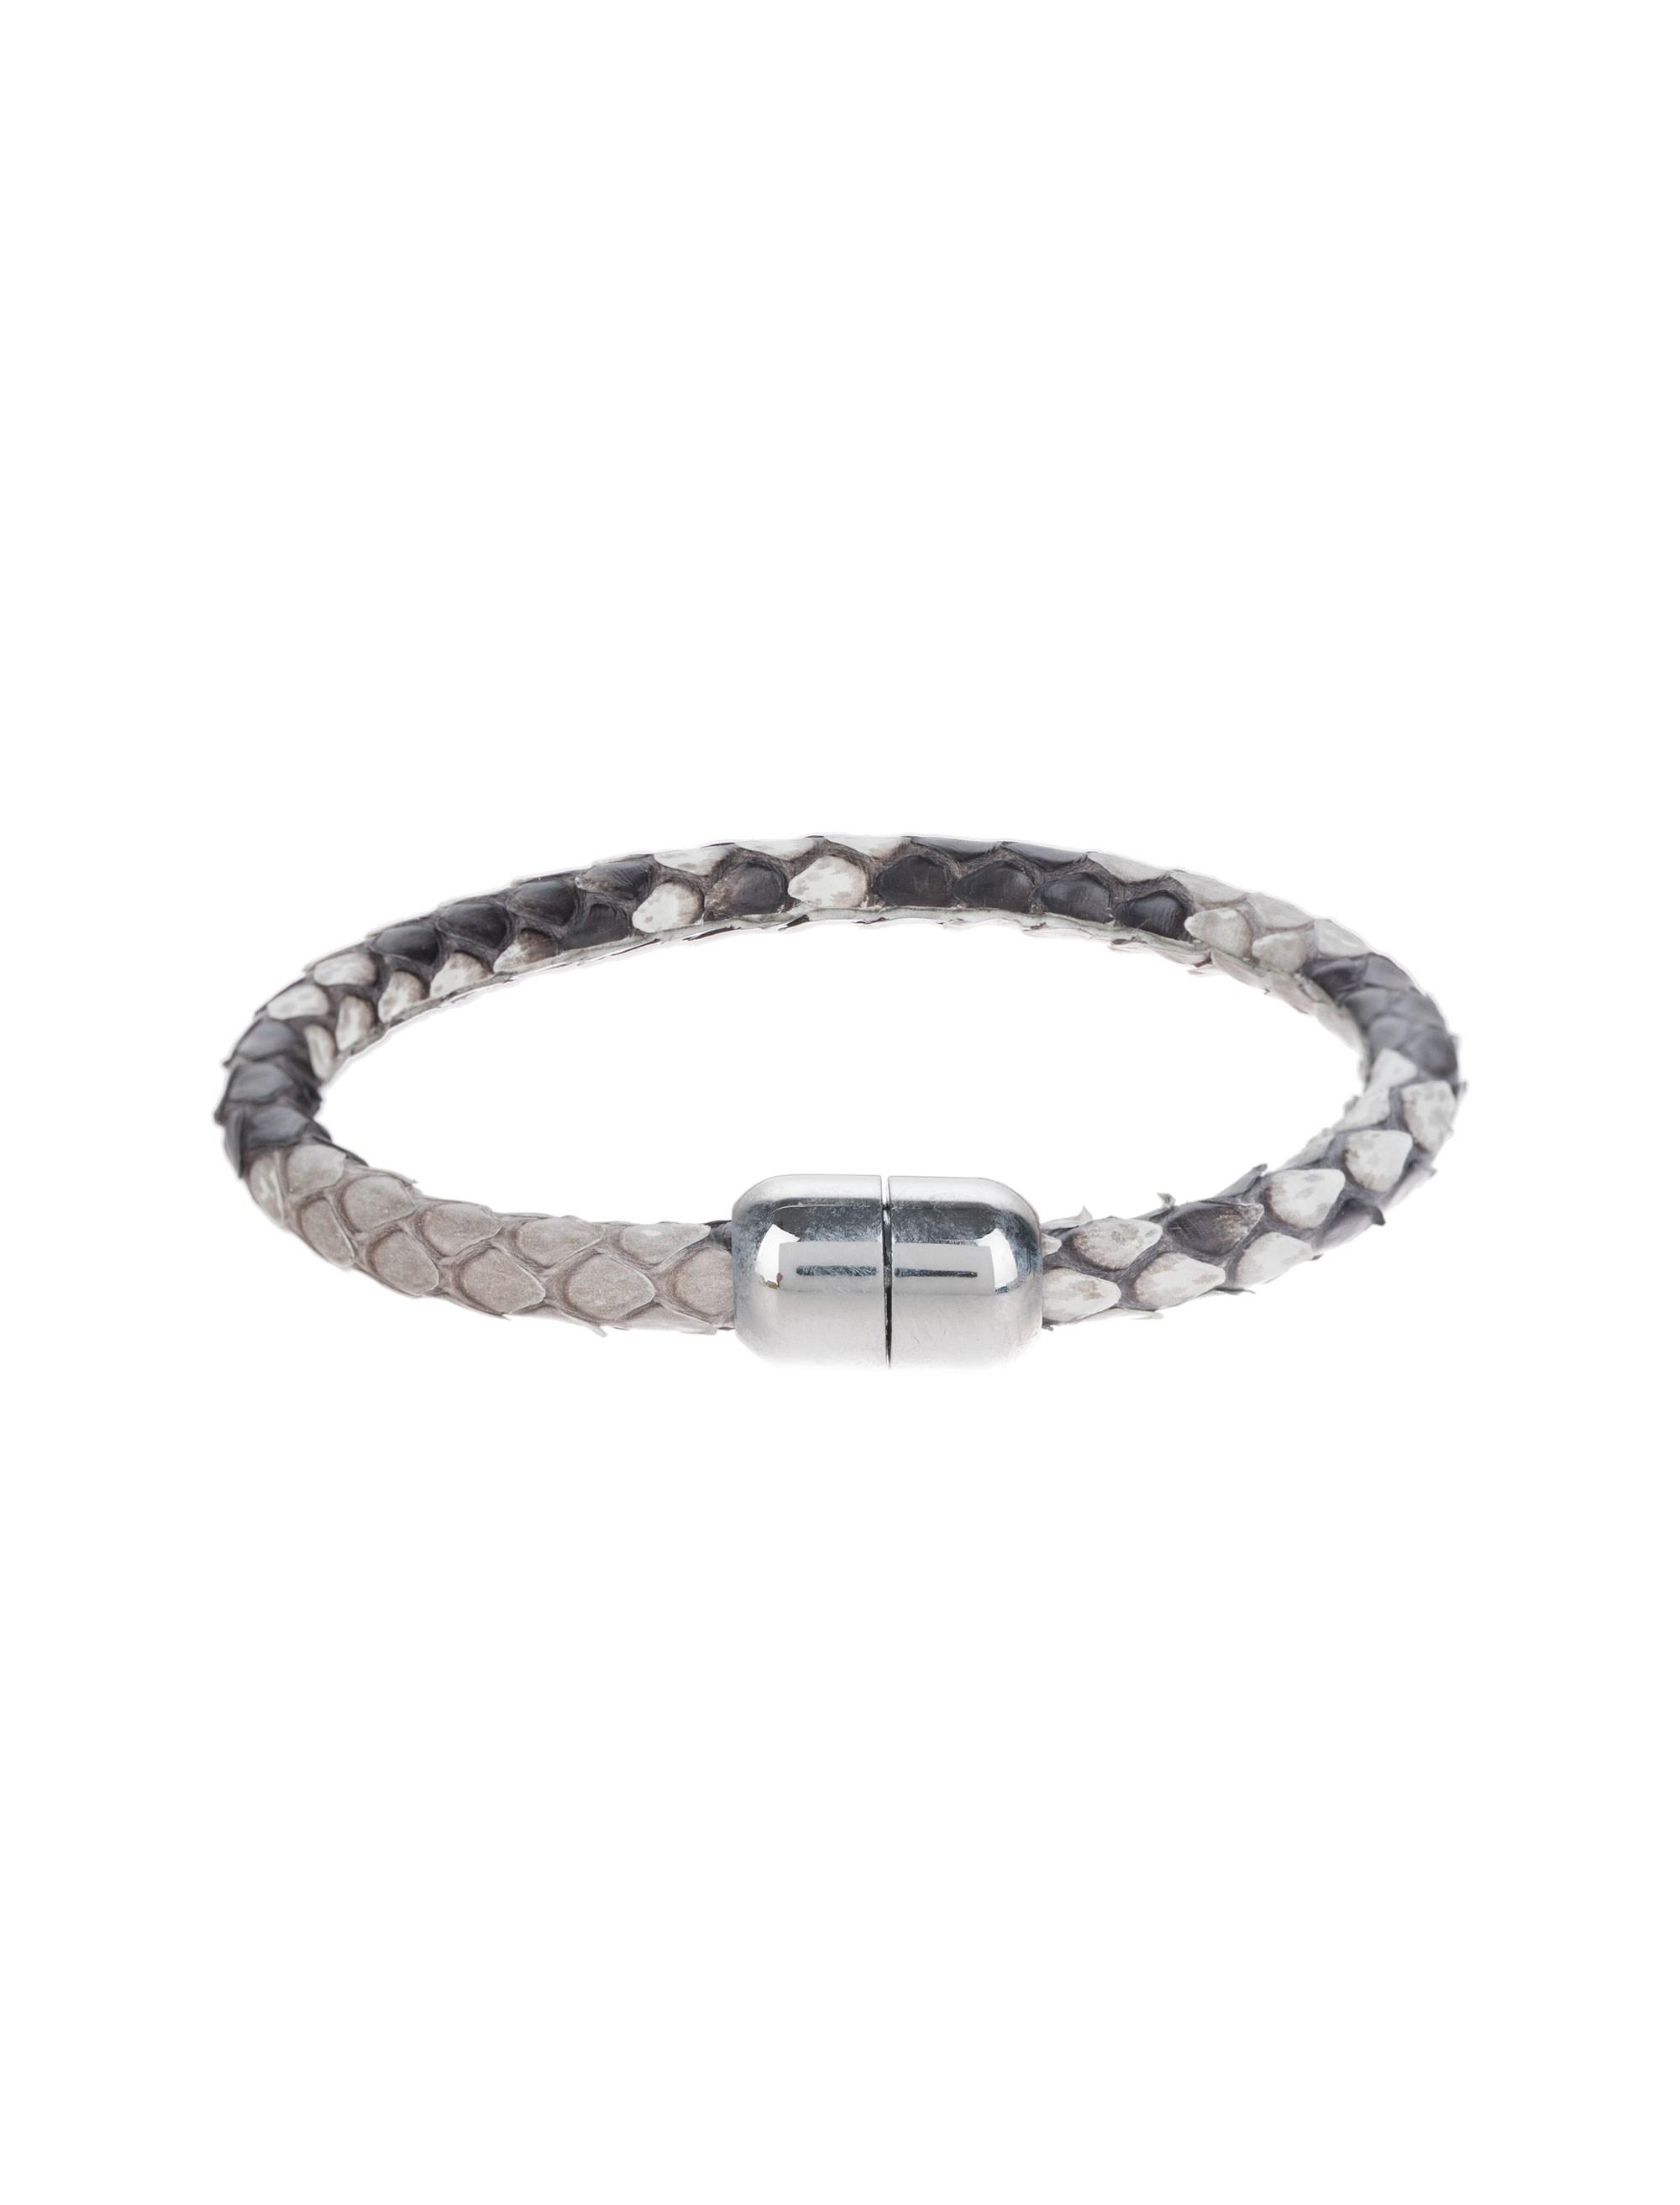 دستبند چرم بزرگسال Jagger - آرتمن